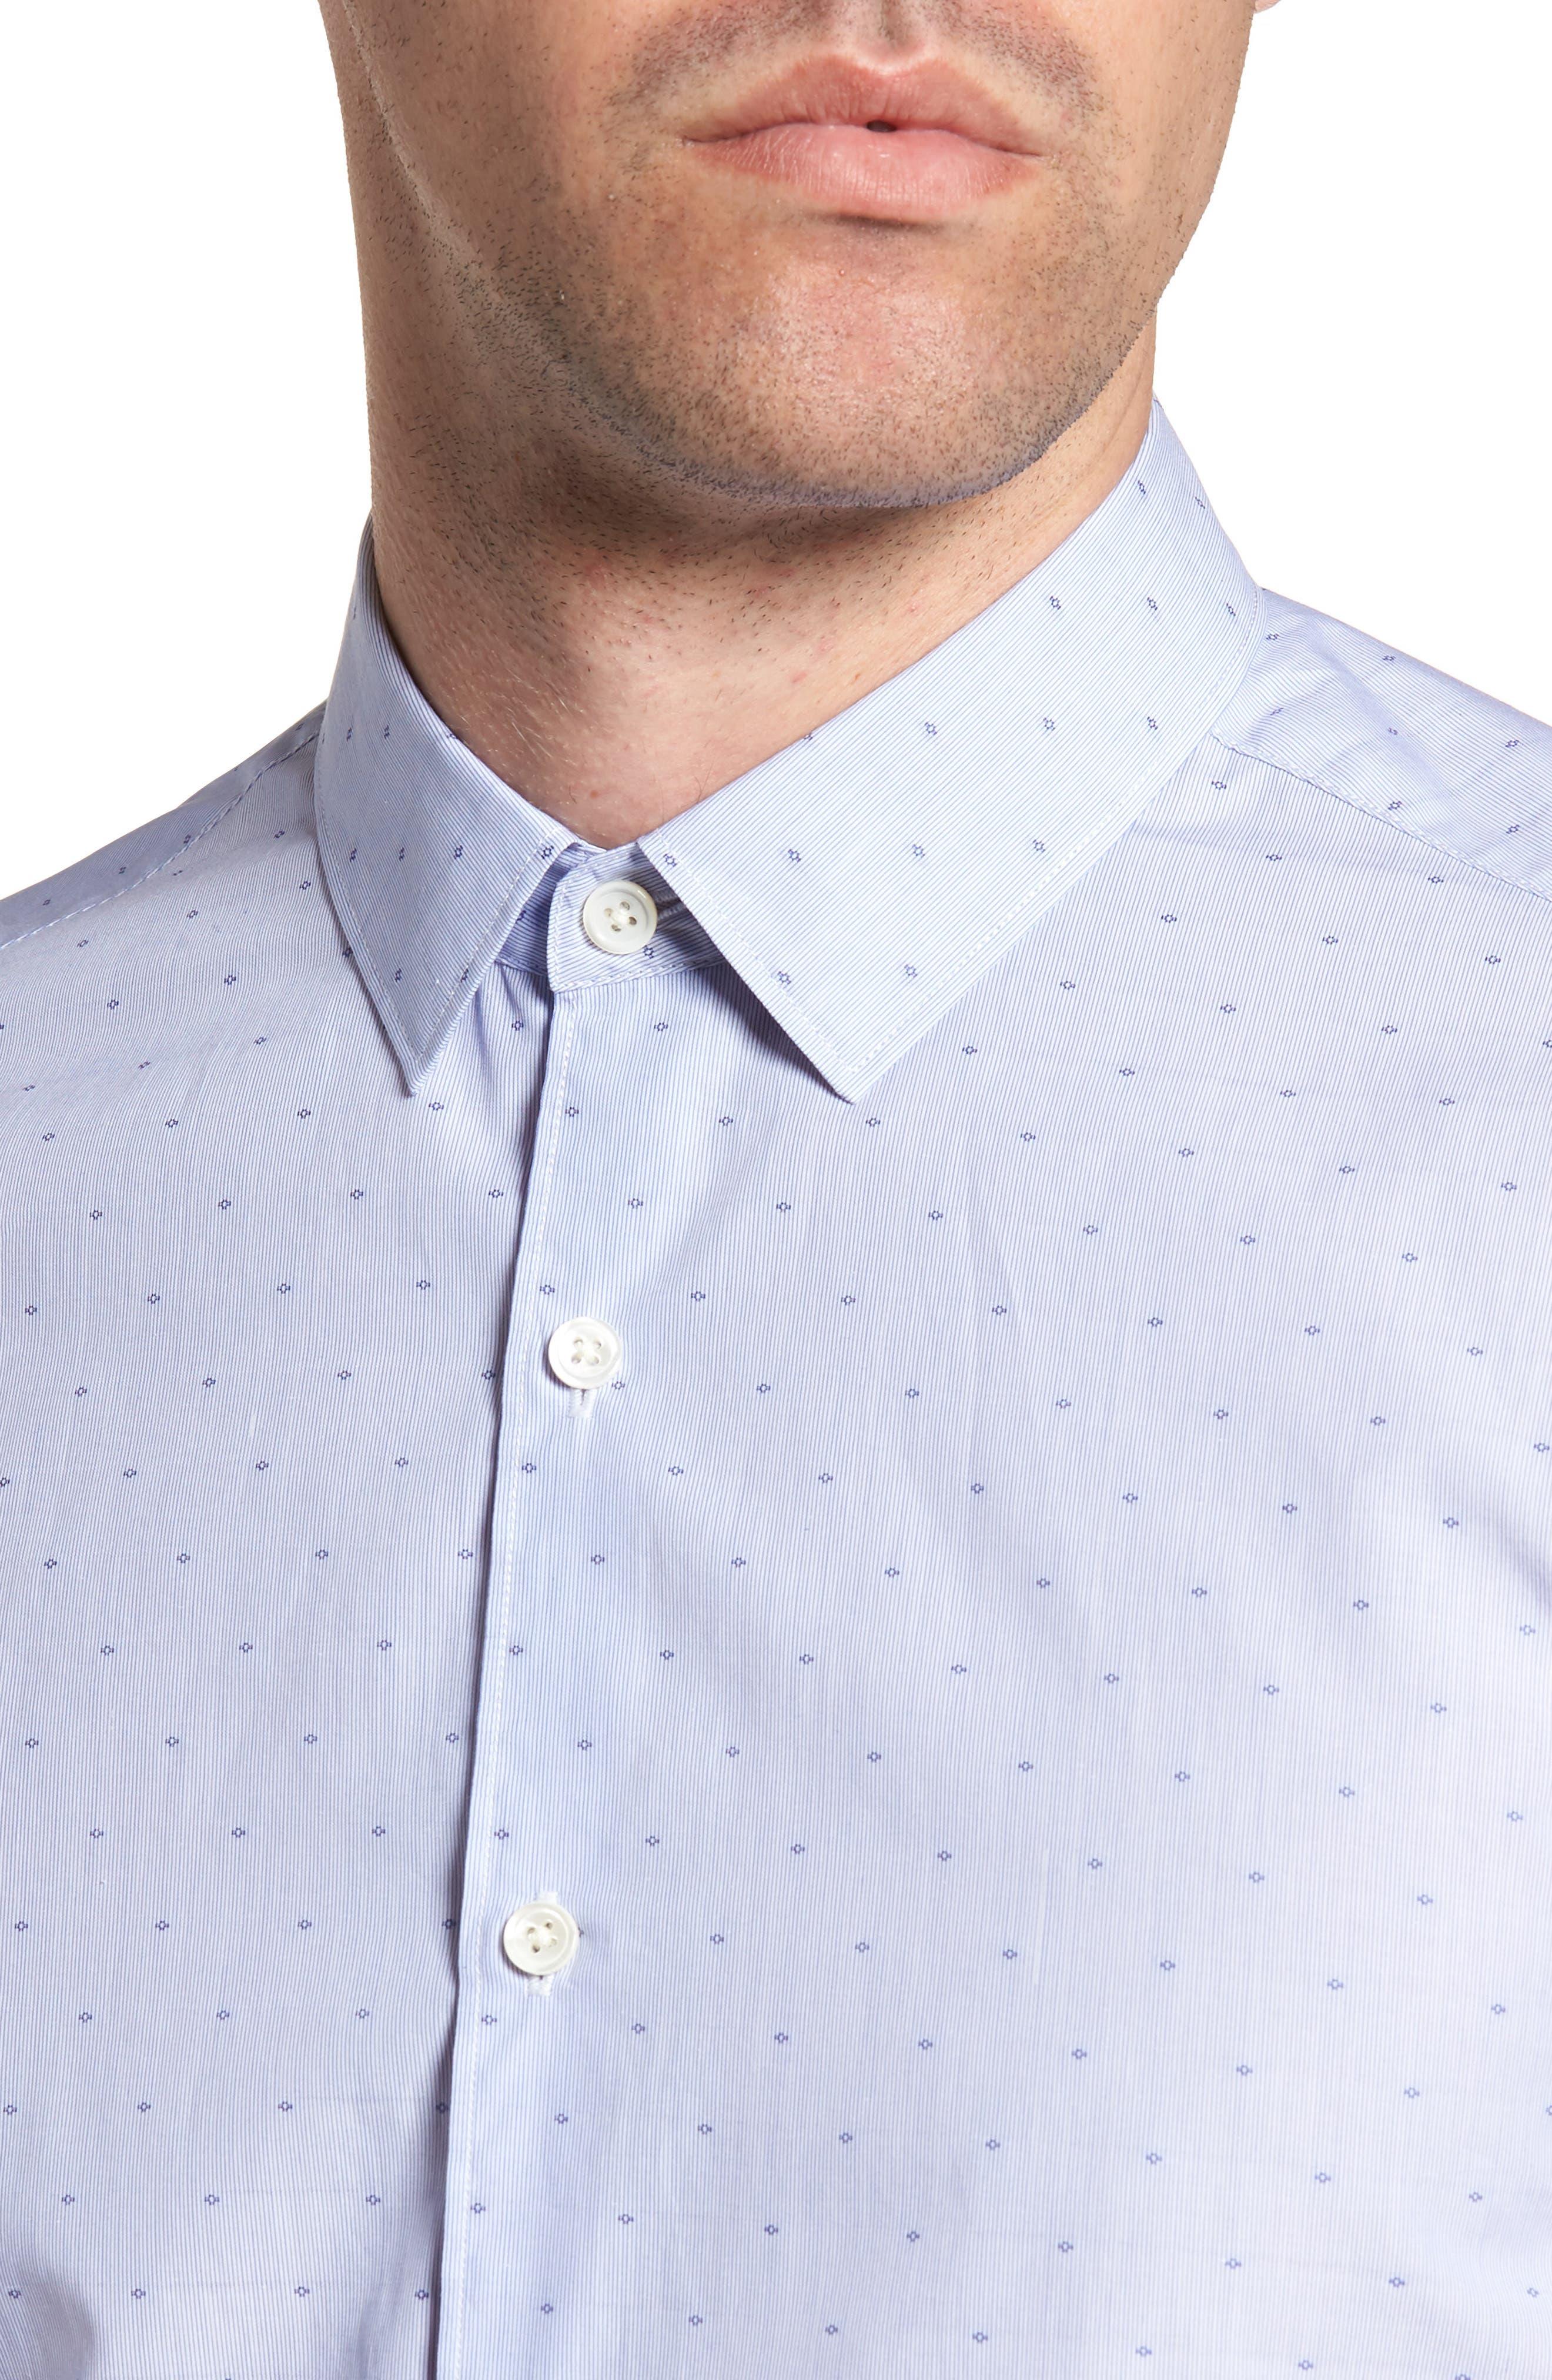 Murrary Coupe Trim Fit Sport Shirt,                             Alternate thumbnail 4, color,                             487